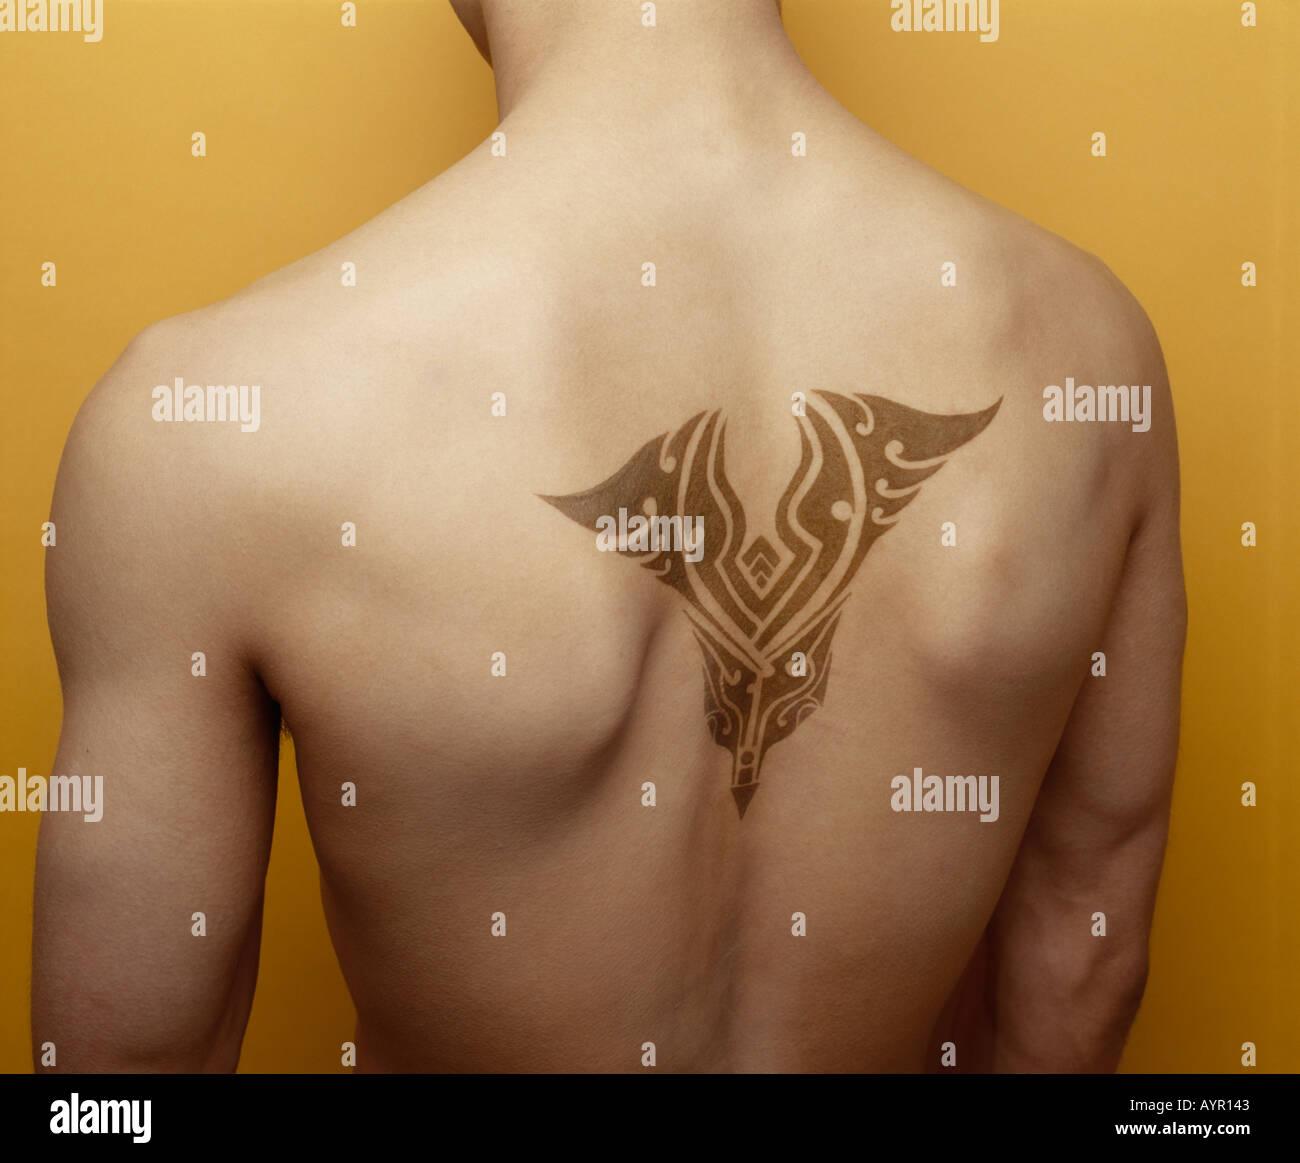 Male Henna Tattoo Across Shoulder Blades Stock Photo 3191106 Alamy